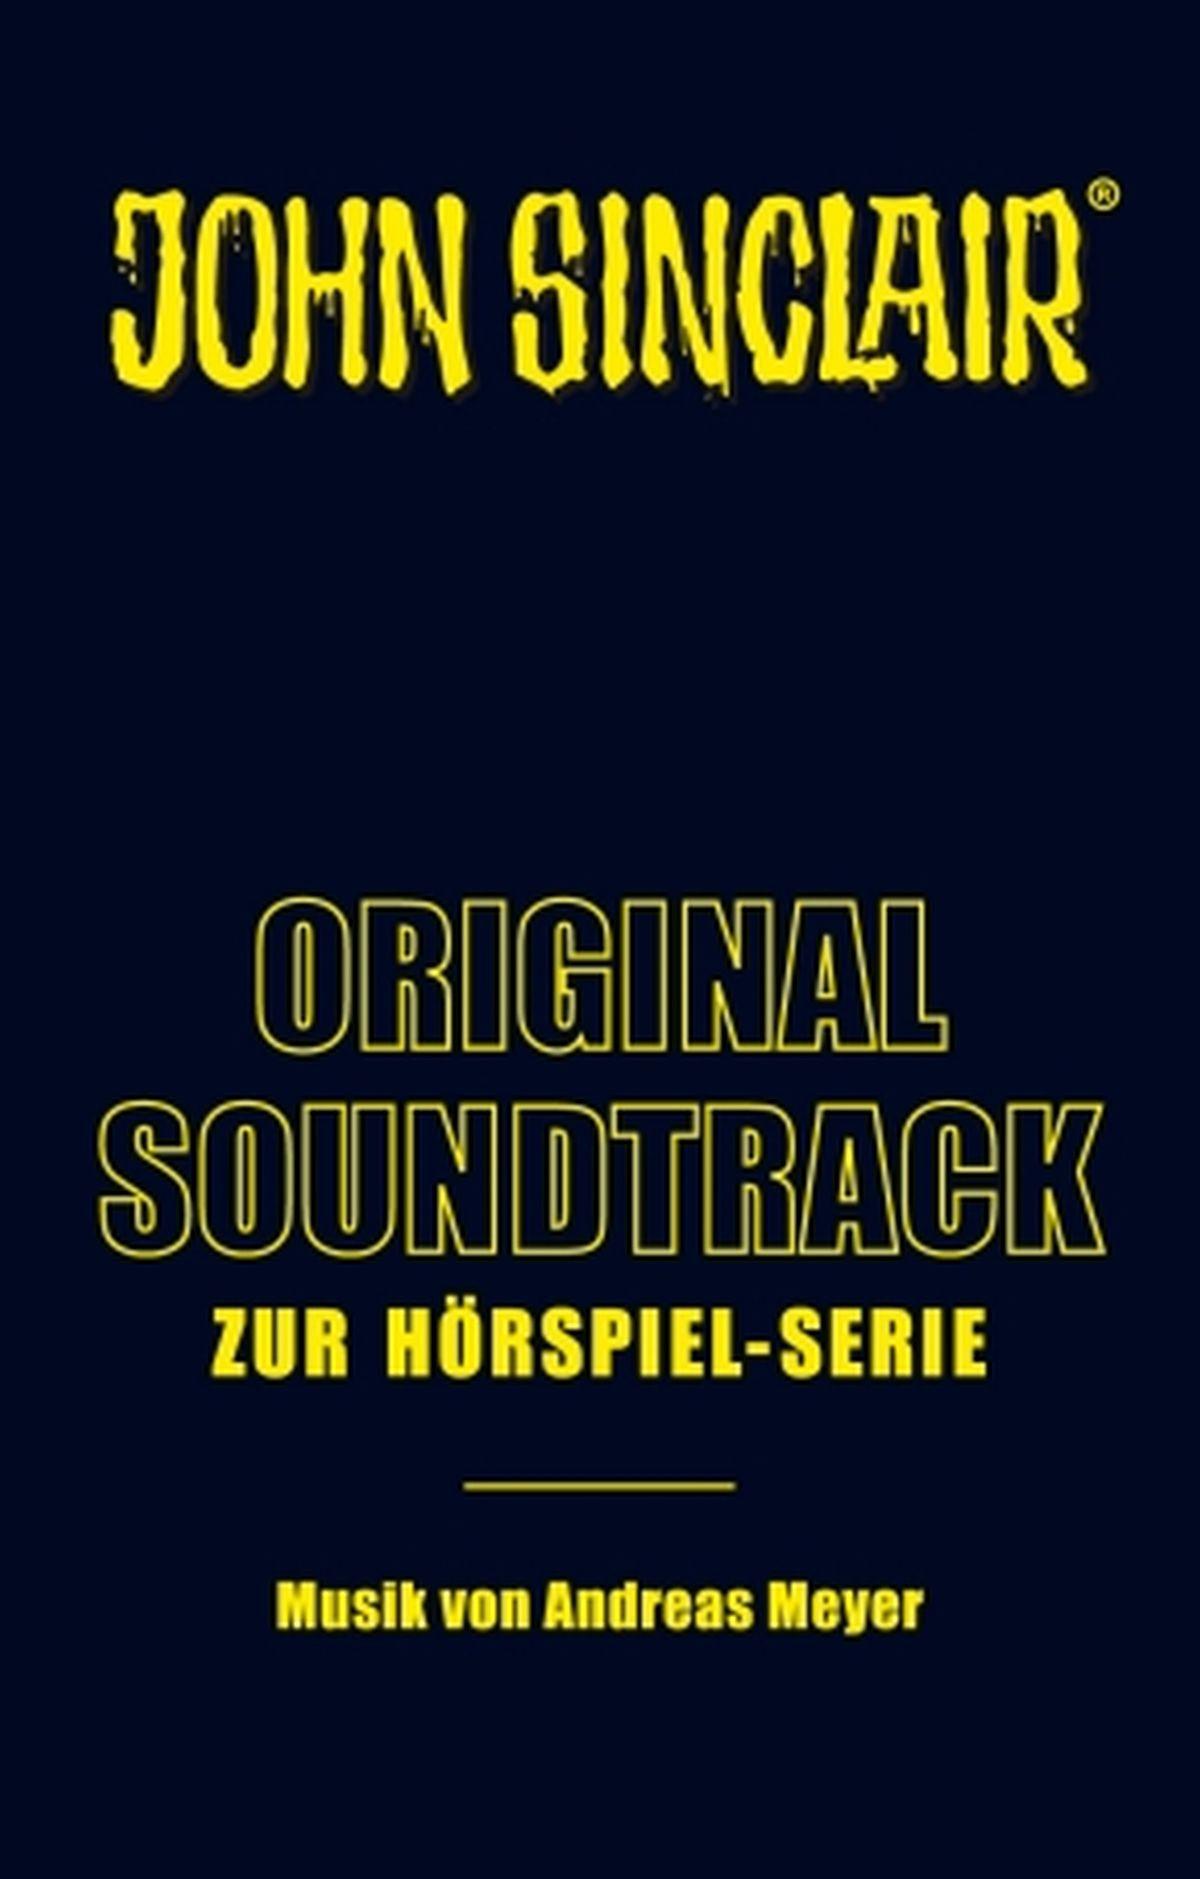 MC John Sinclair: Original-Soundtrack zur Hörspielserie